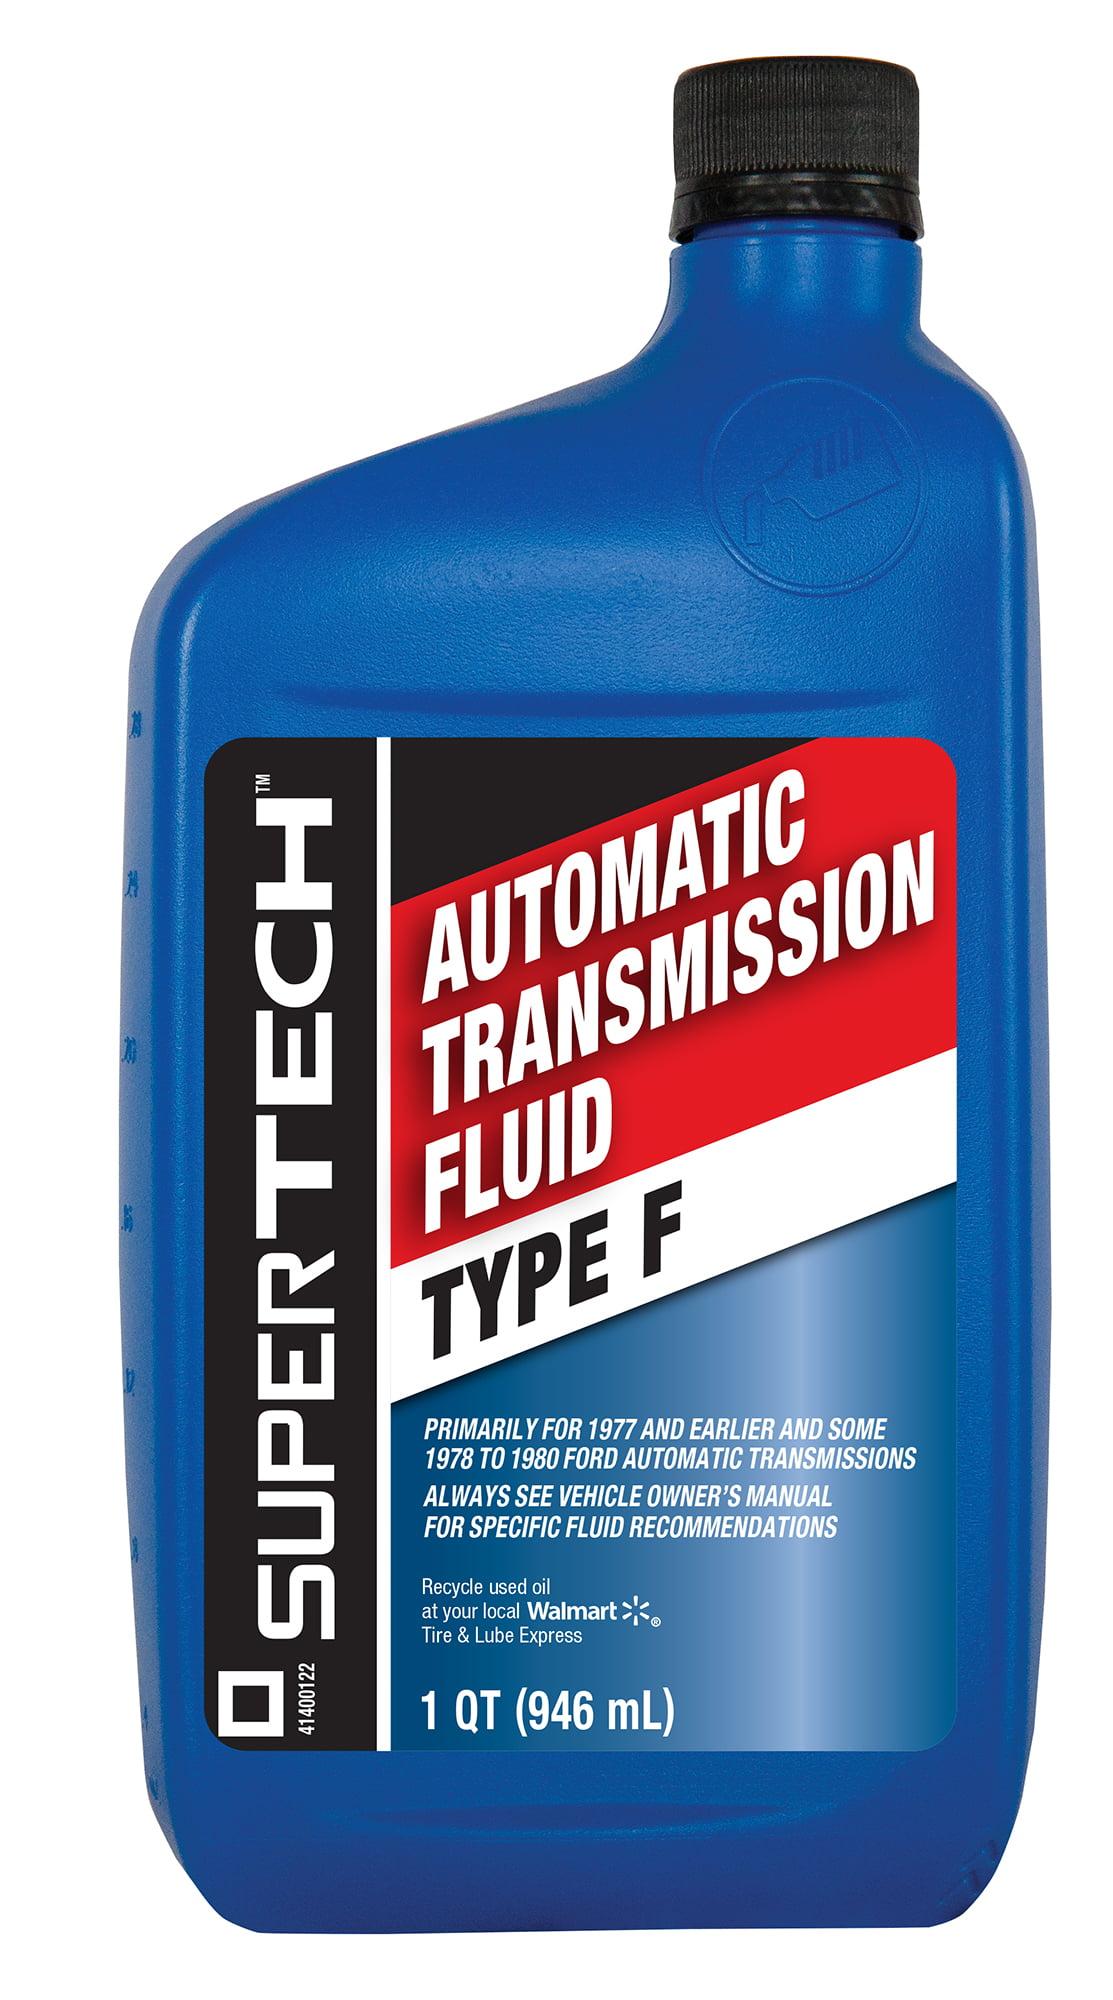 Super Tech Automatic Transmission Fluid Type F 78742026732 | eBay